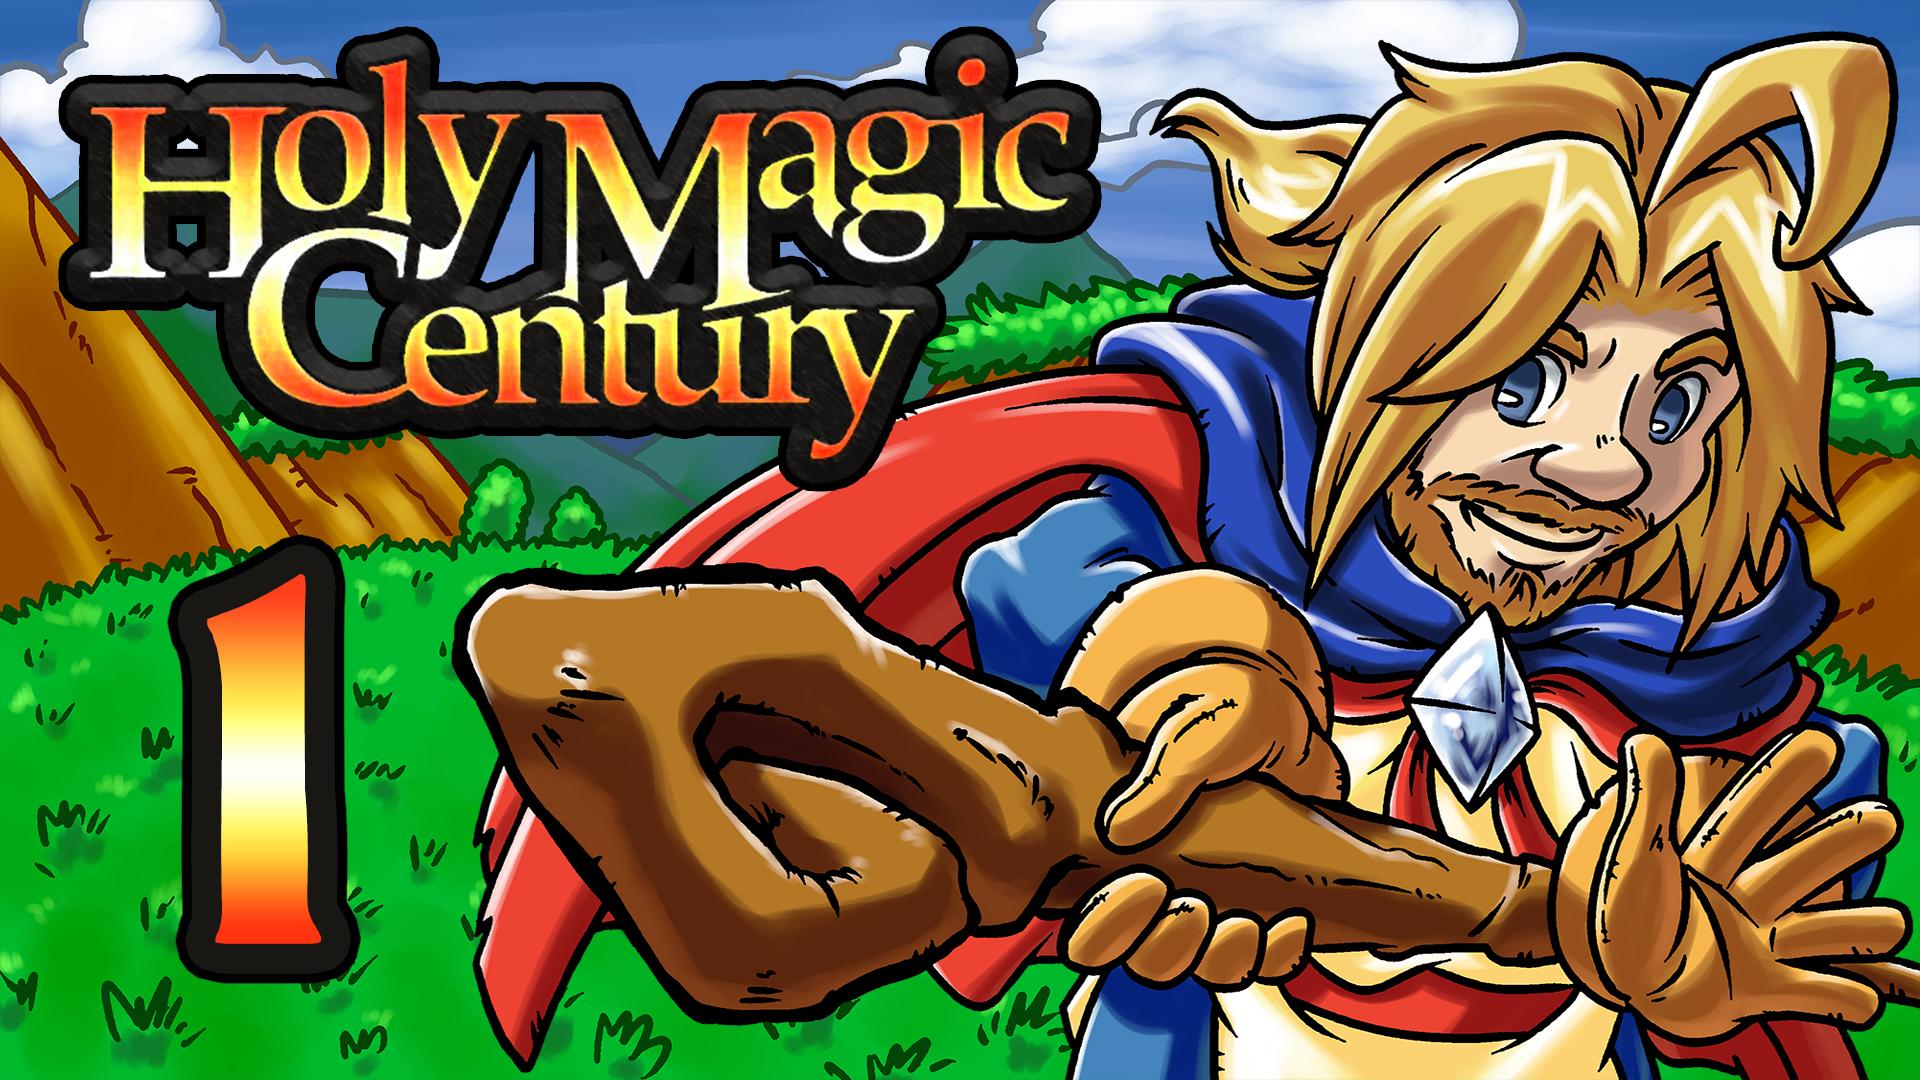 LLL - Holy Magic Century Thumbnail